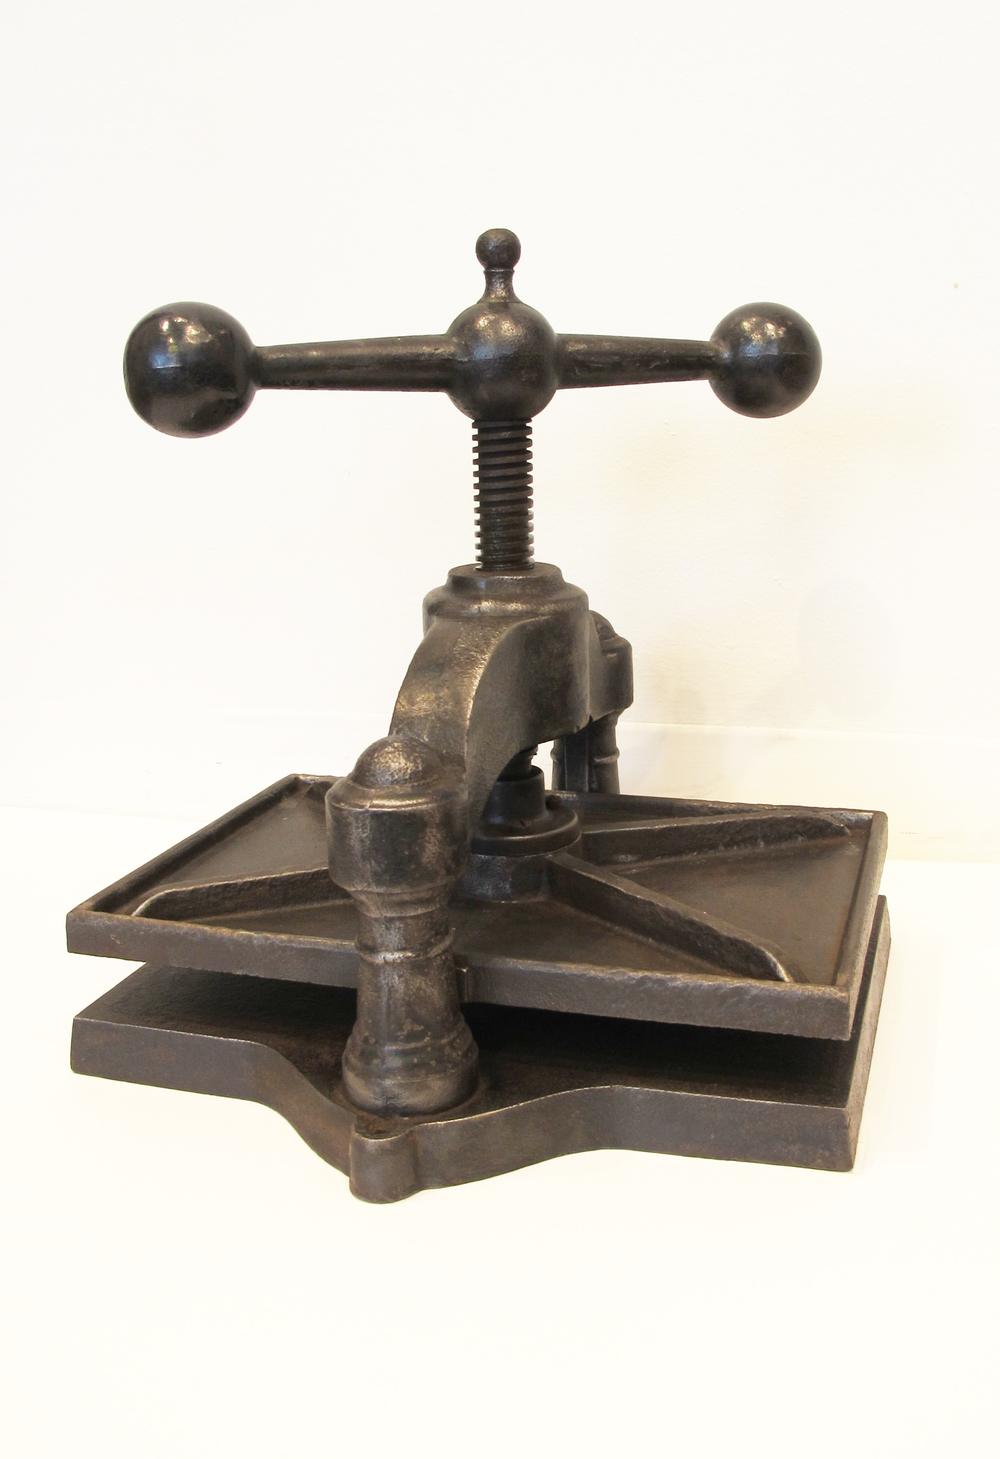 Antique Book Press.jpg